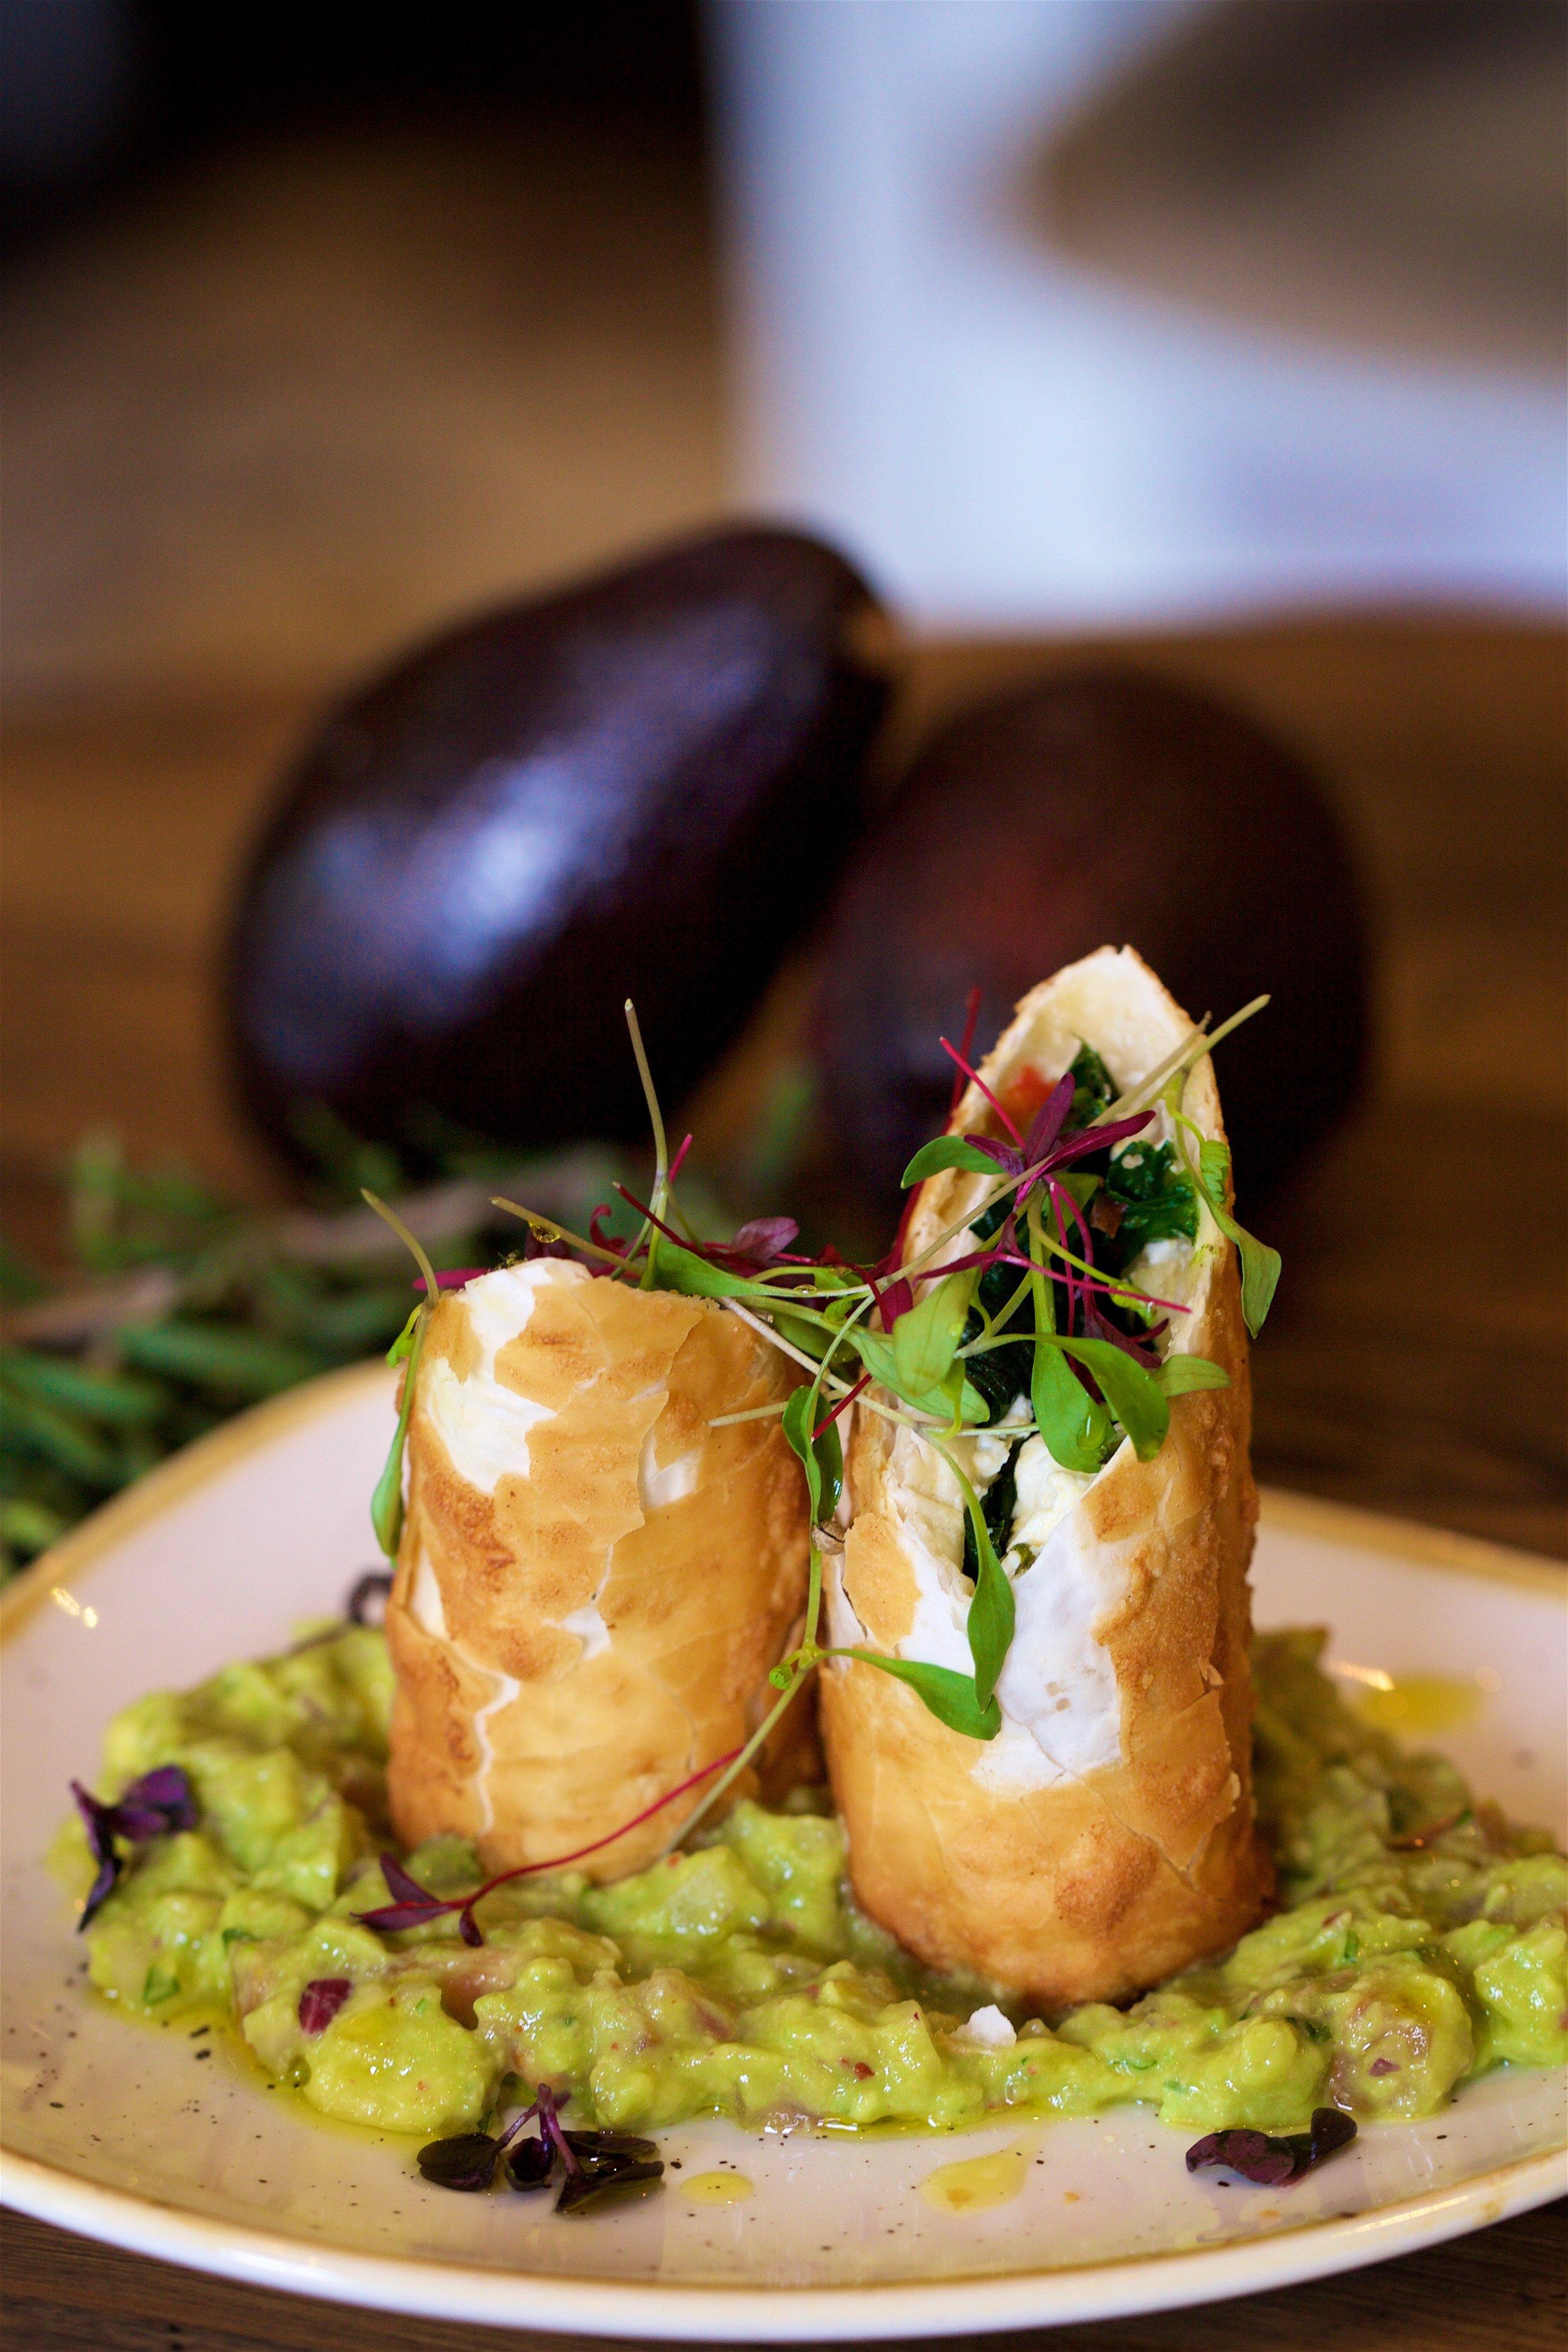 ROLLO DE ESPINACAS - Fillopastry roll spinach, onion, chillies, feta cheese, guacamole